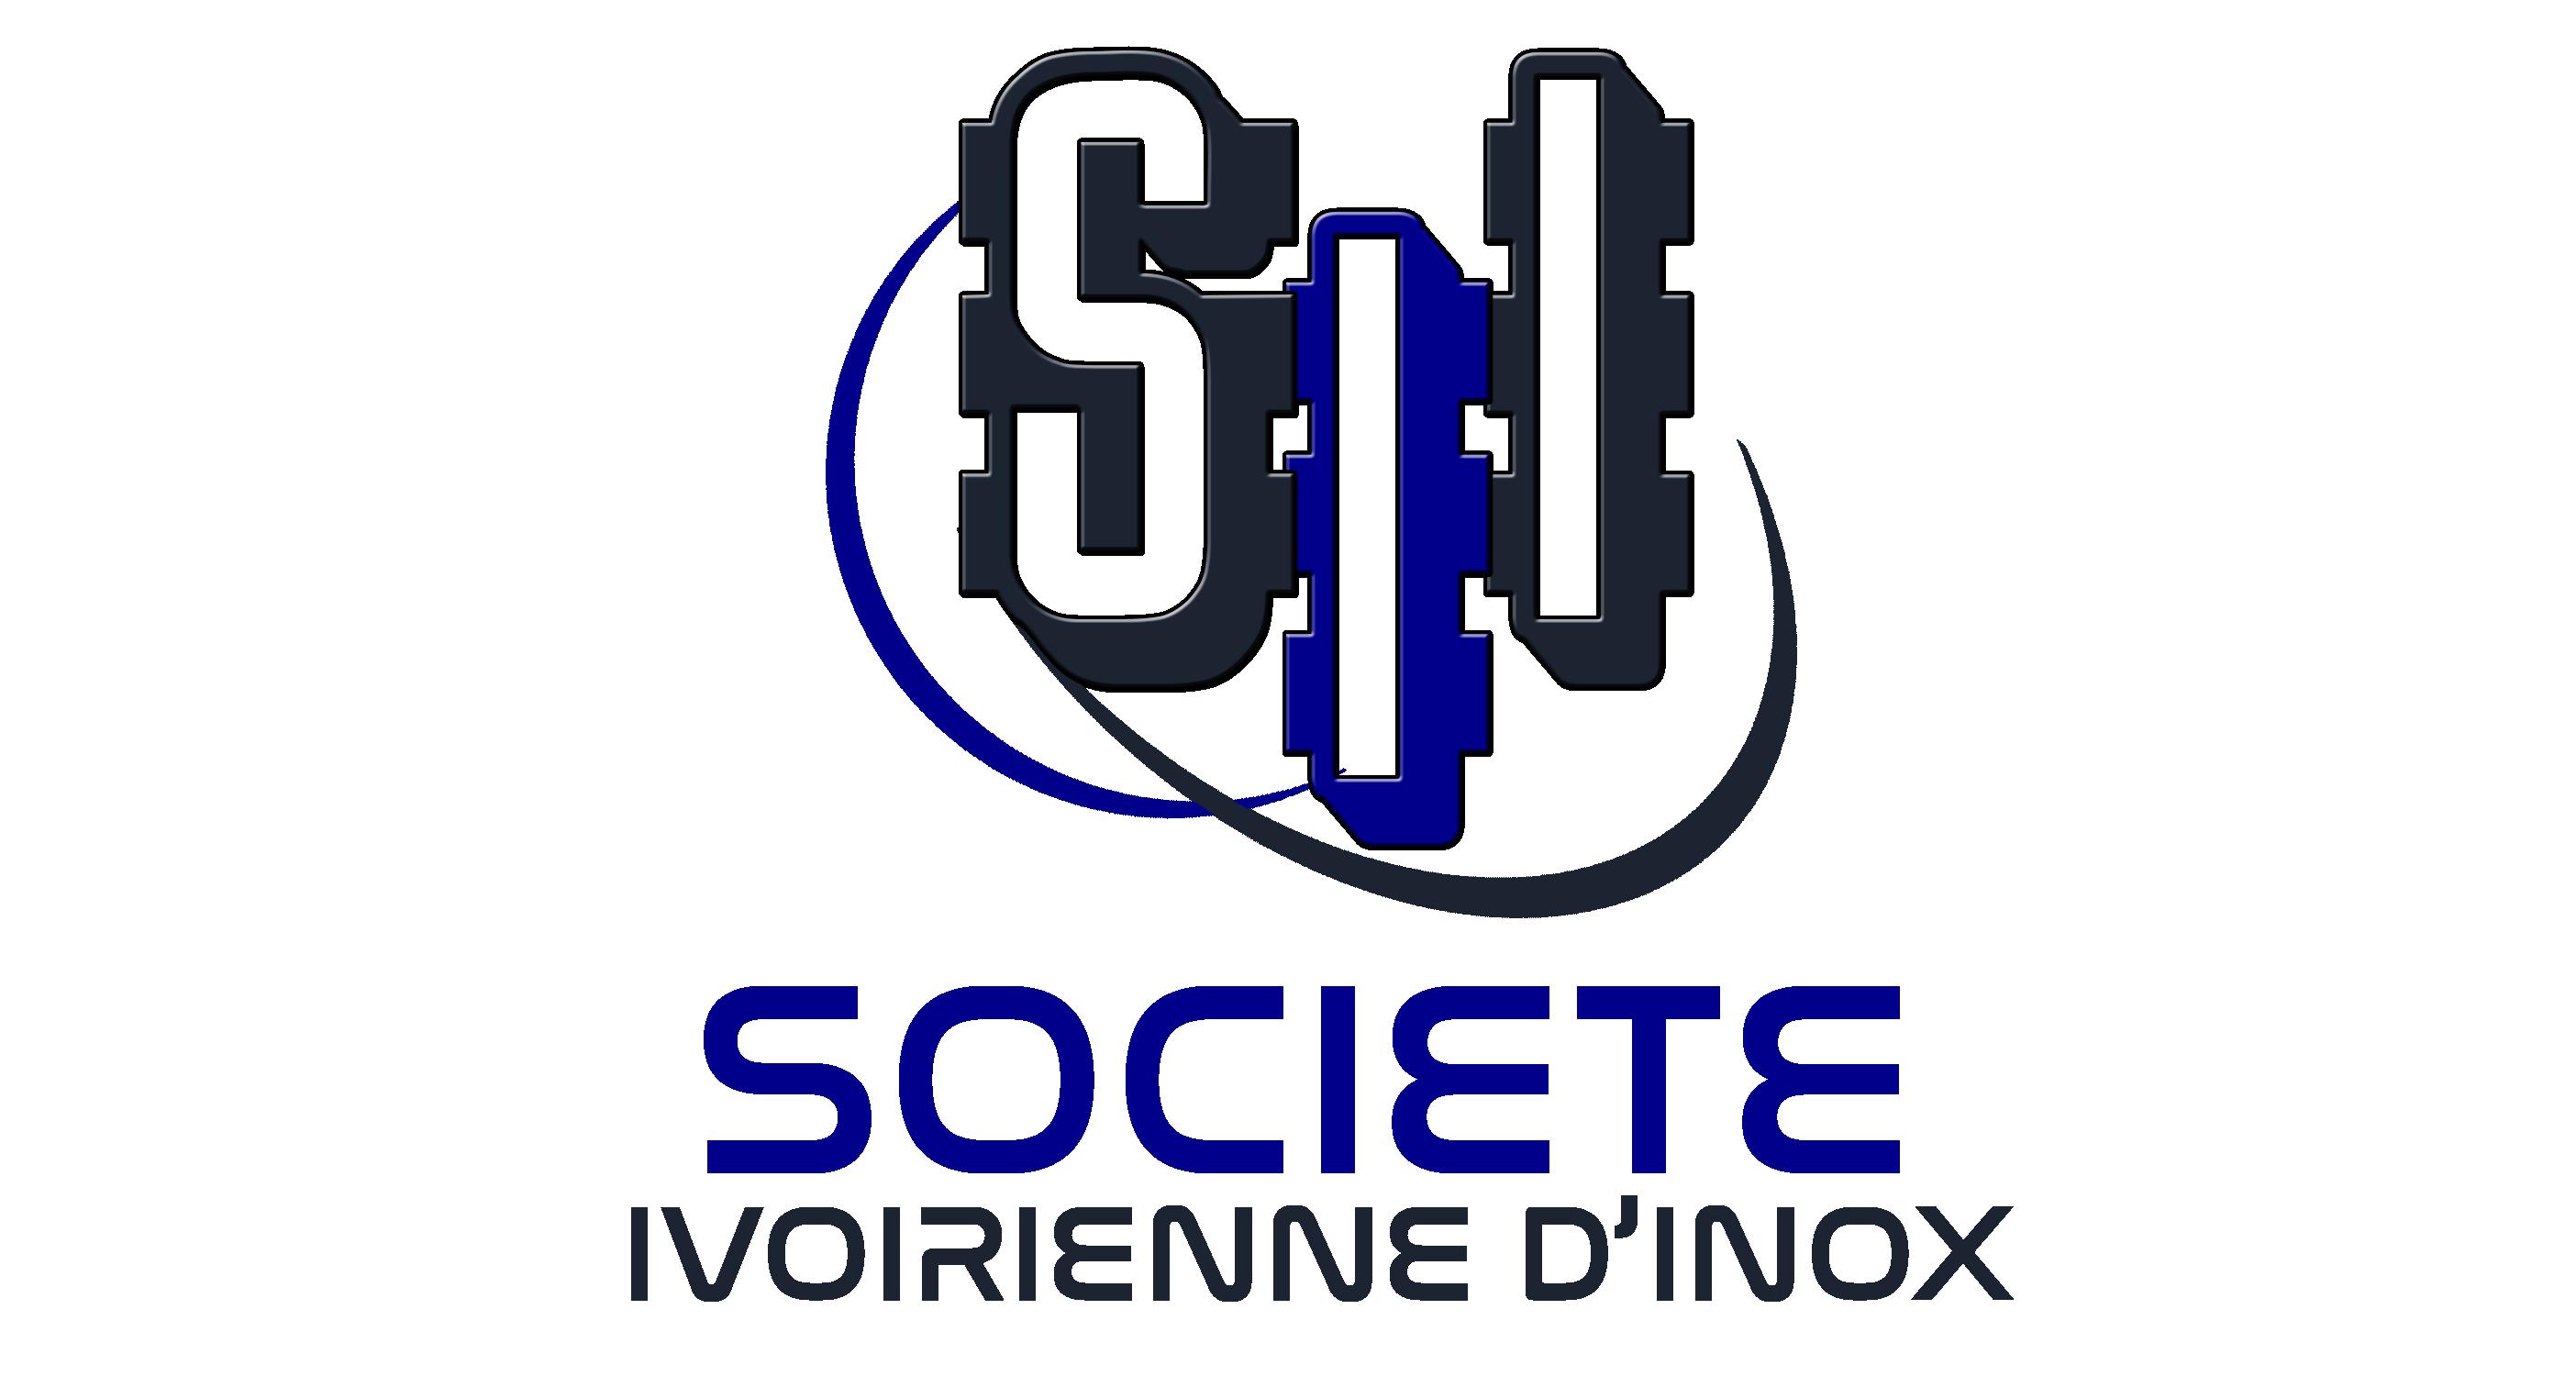 SOCIETE IVOIRIENNE D'INOX